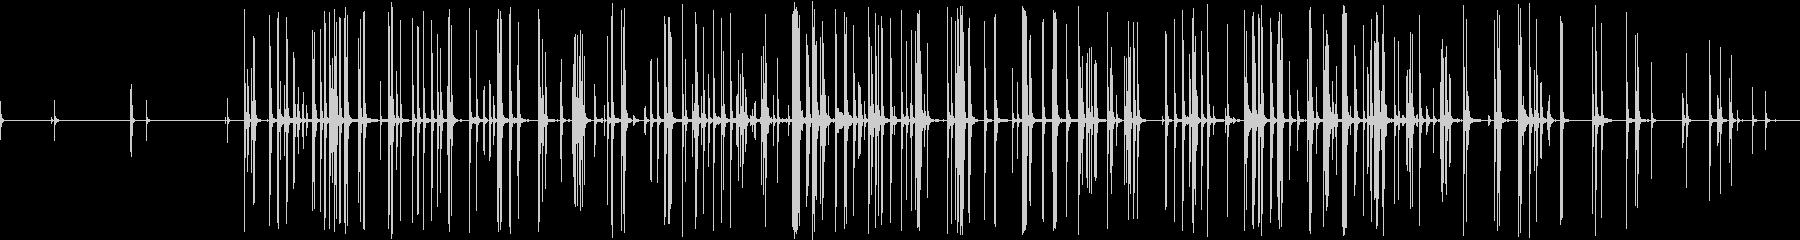 CLAY CHIMES、PERCU...の未再生の波形